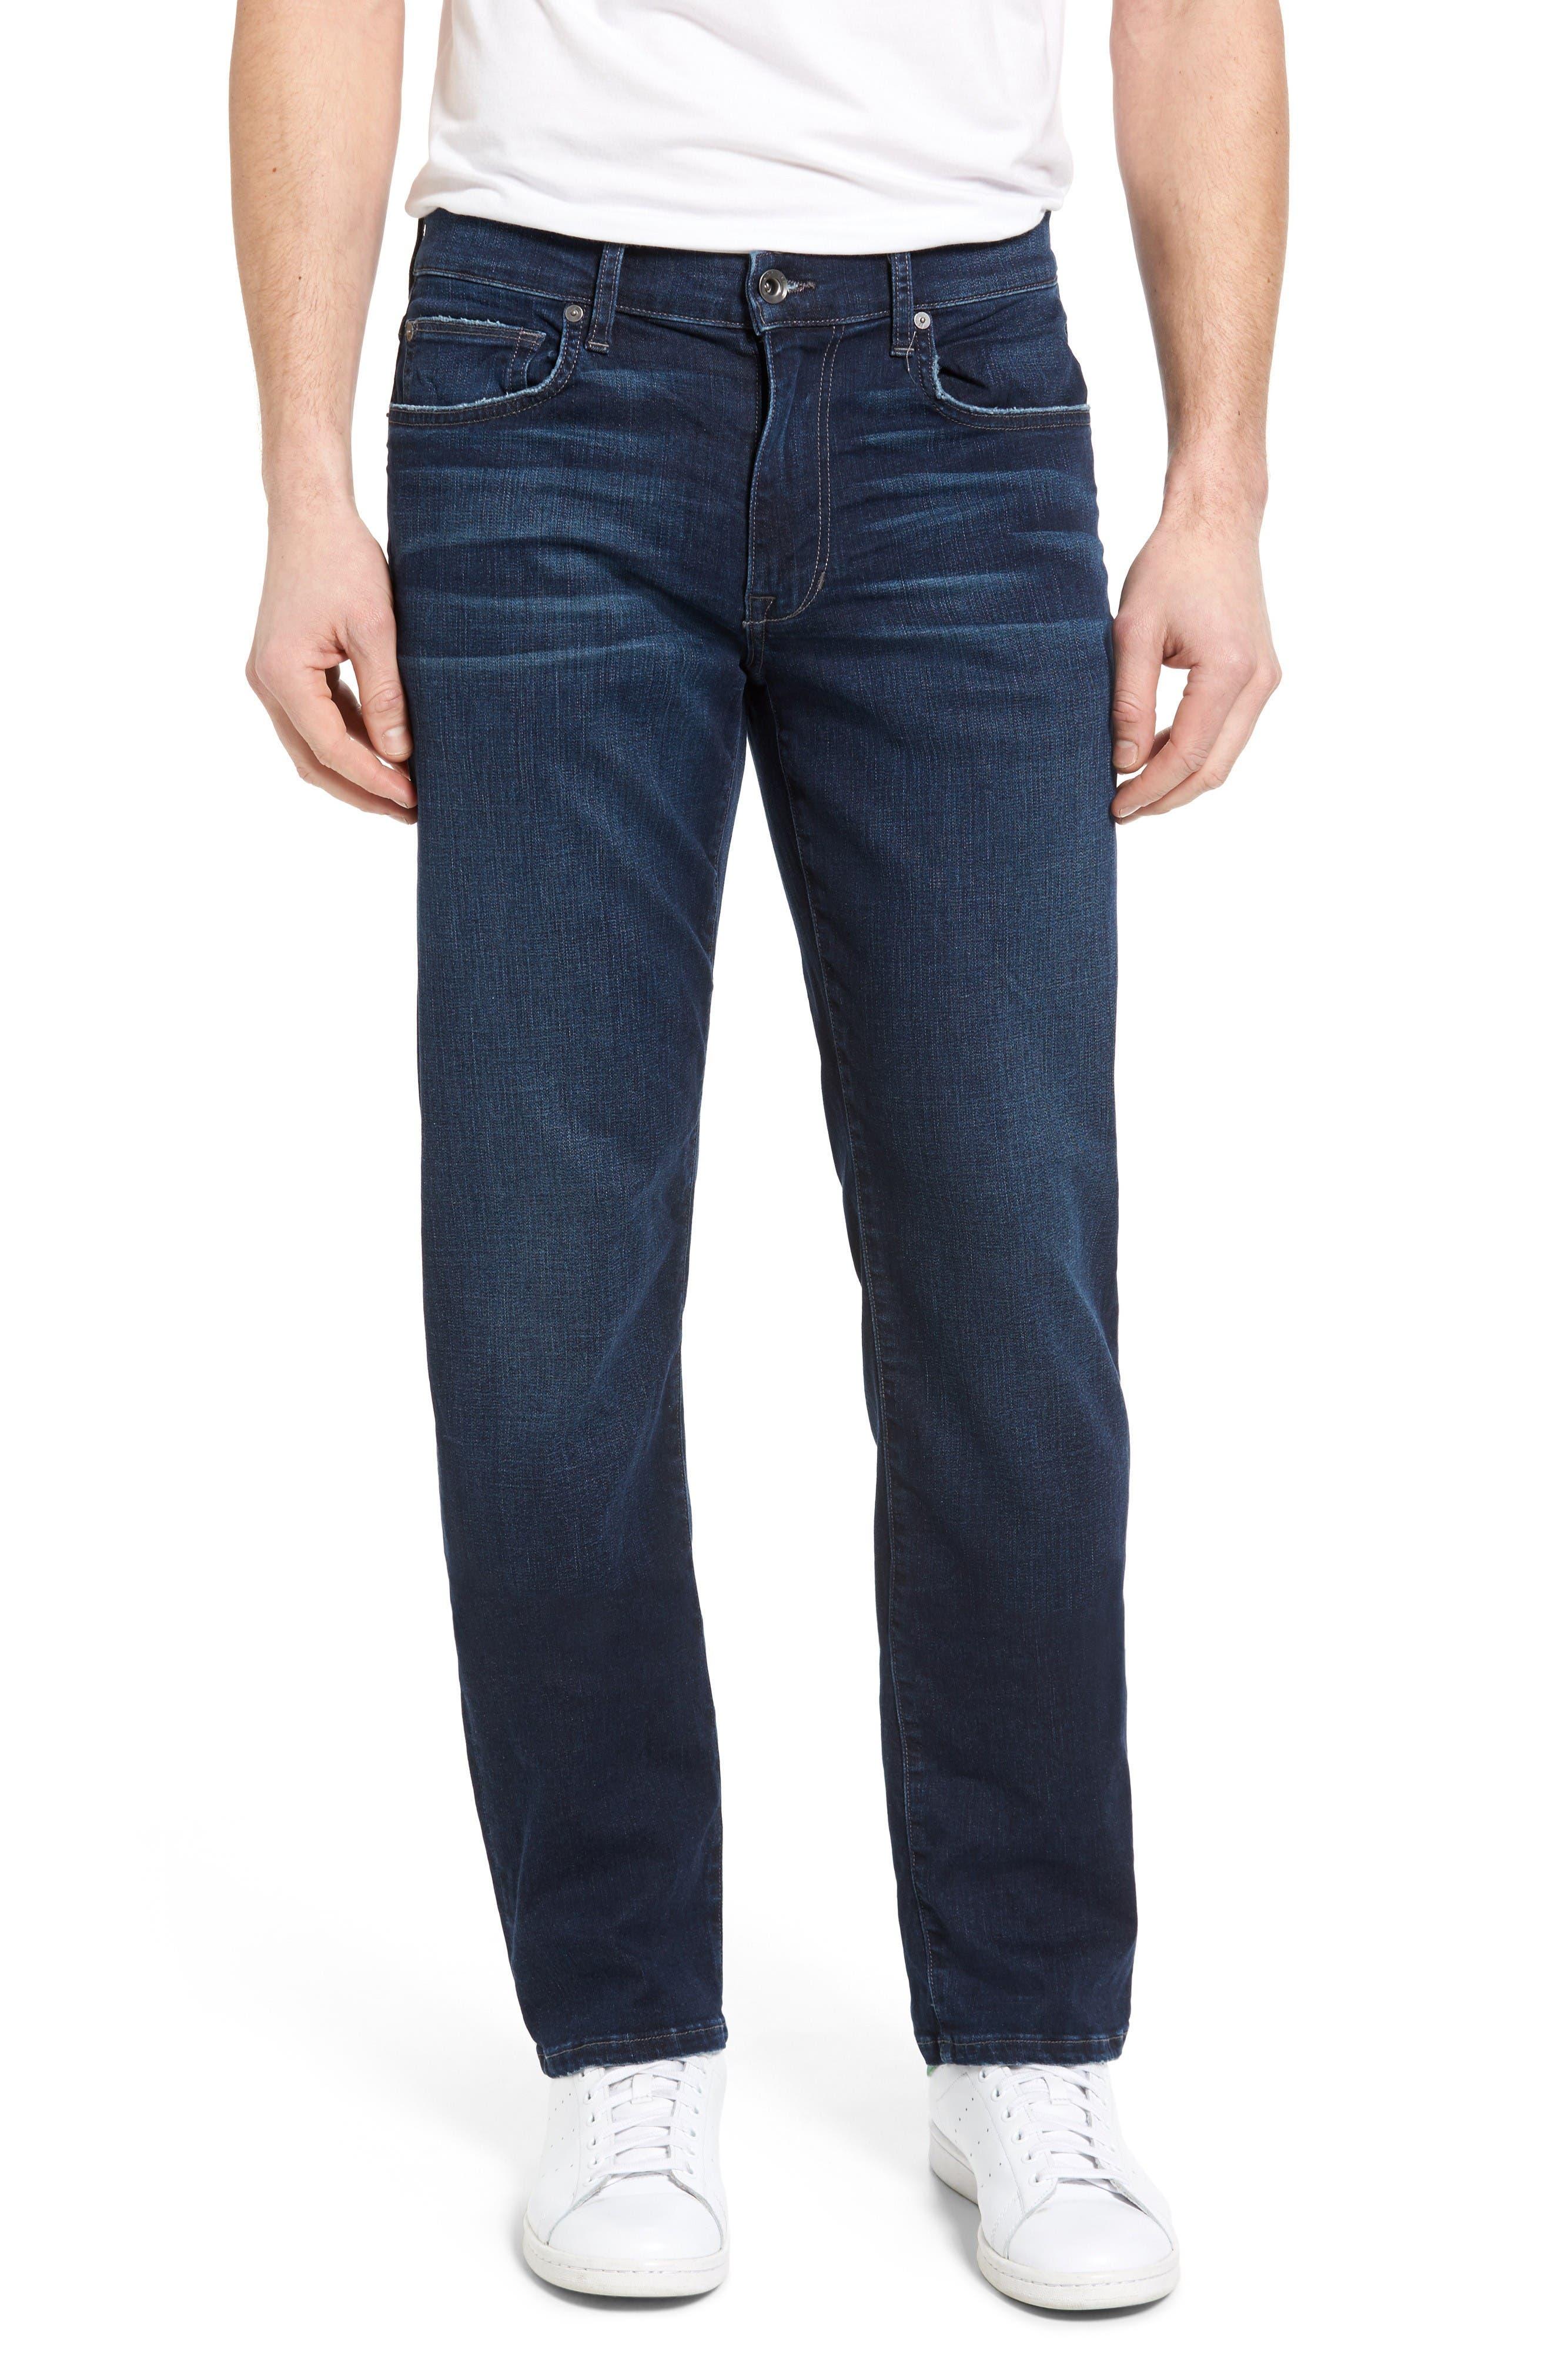 Brixton Kinetic Slim Straight Leg Jeans,                             Main thumbnail 1, color,                             Aedan